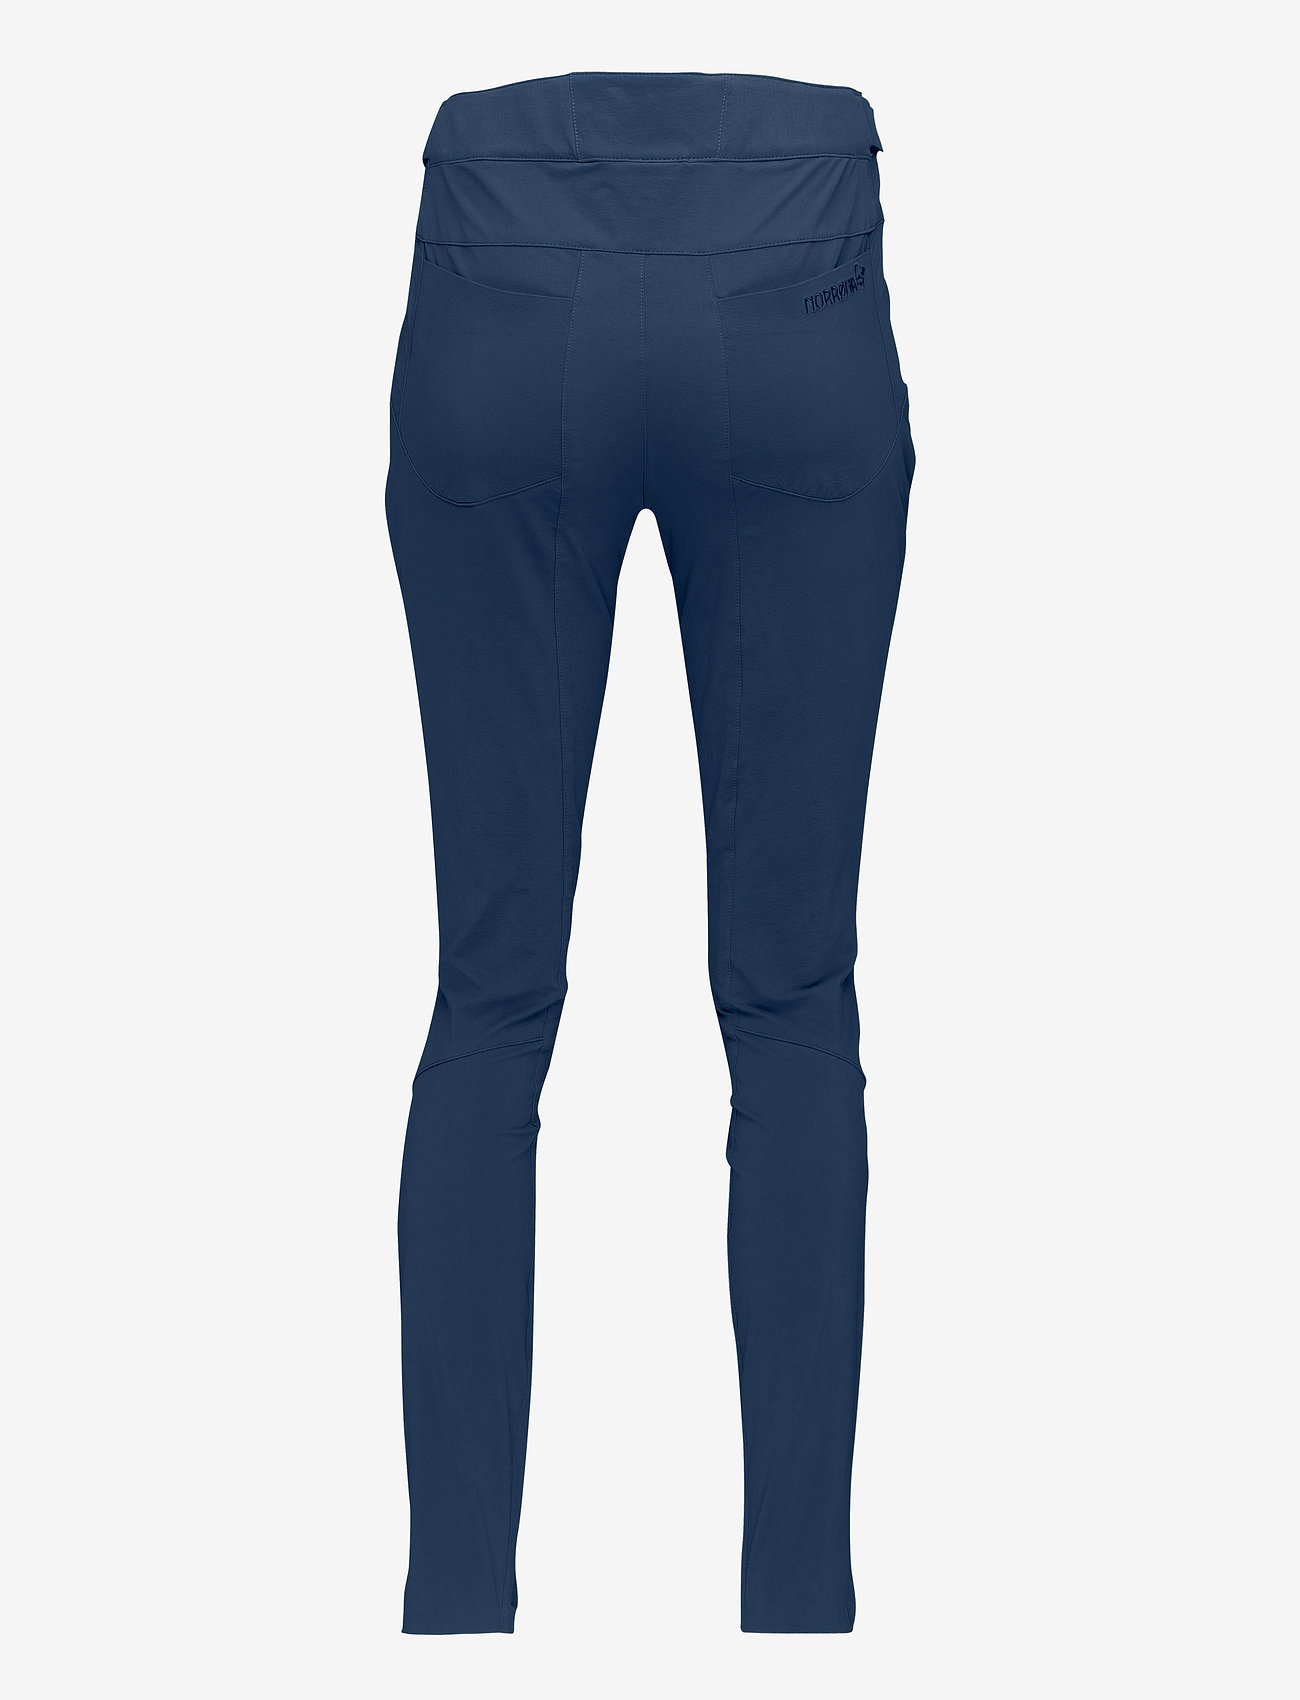 Norrøna - falketind flex1 slim Pants W's - friluftsbukser - indigo night - 1